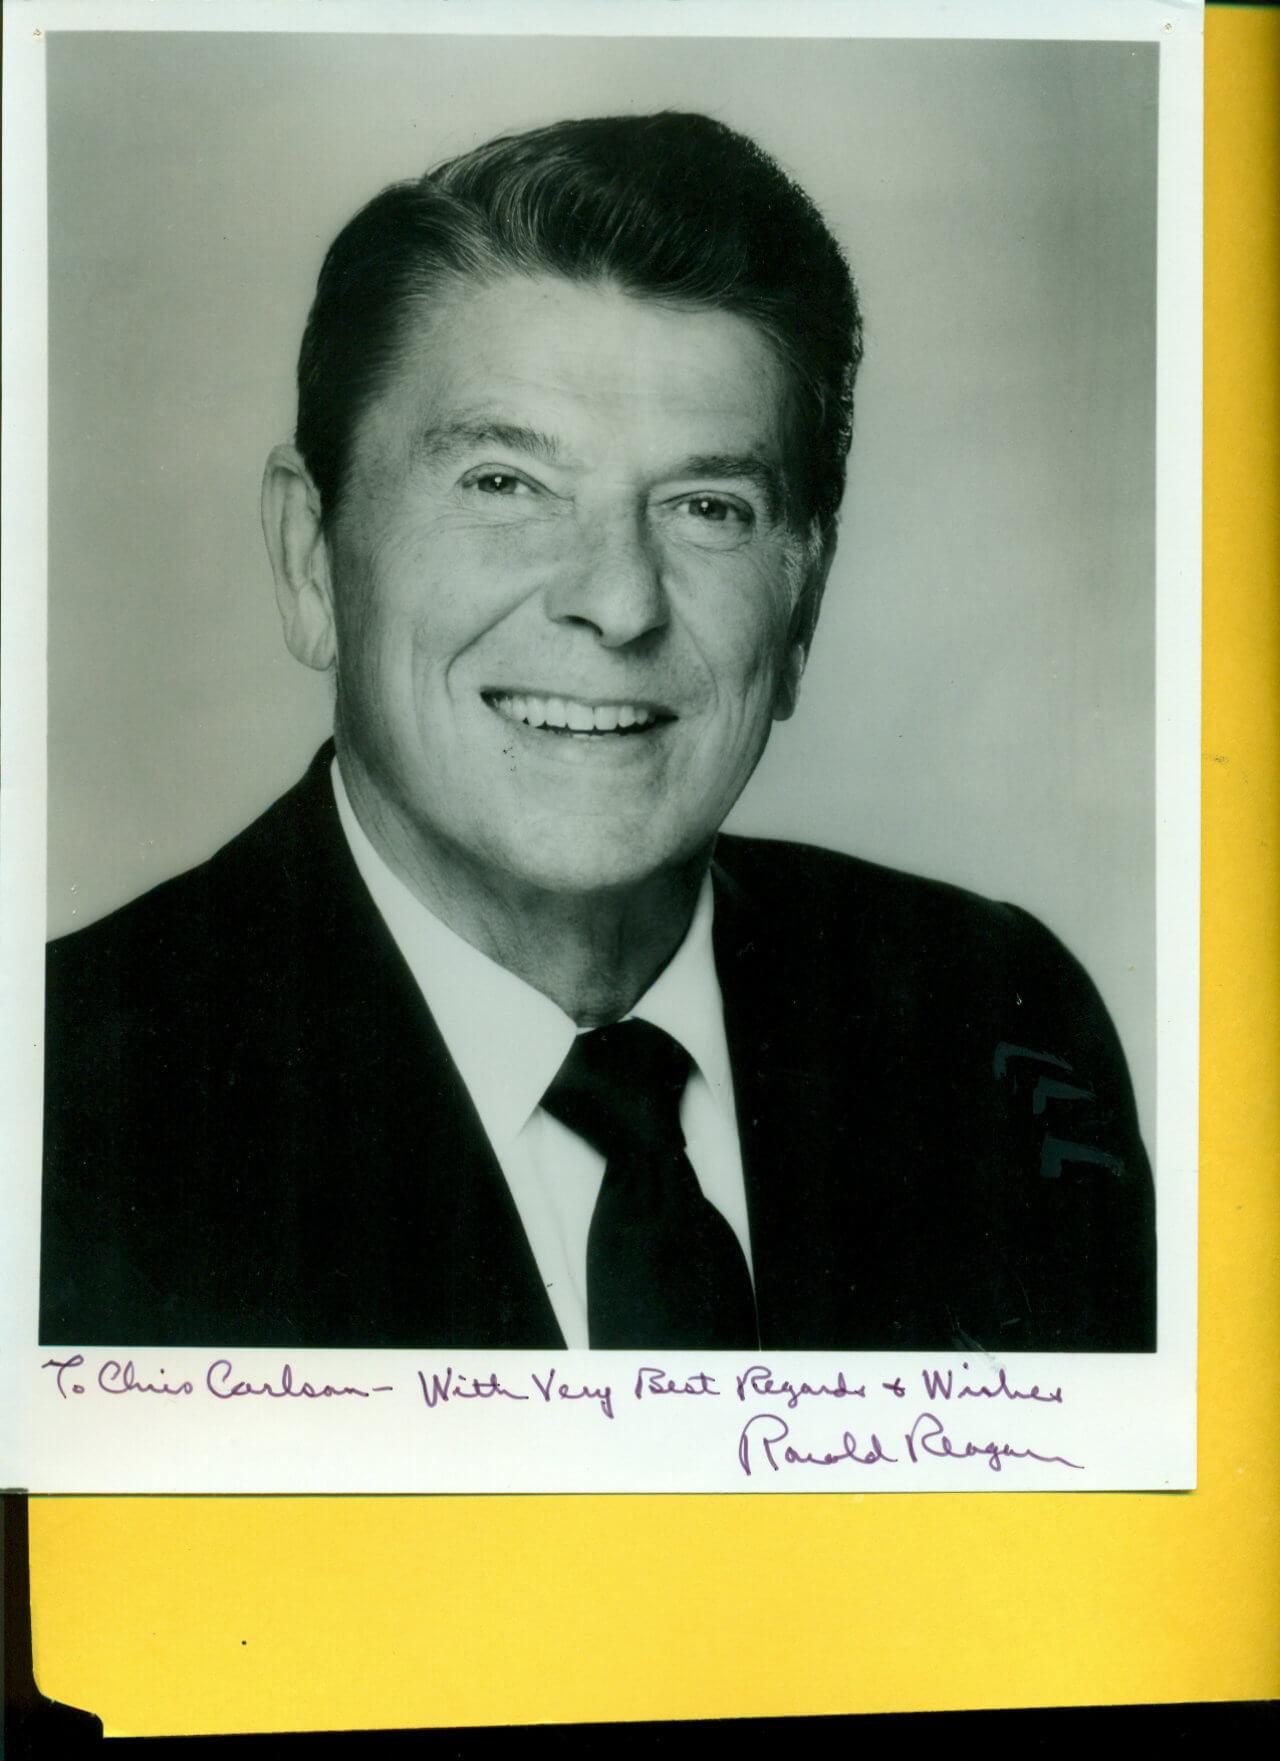 President - Ronald Reagan Signed & Inscribed 8x10 Photo (JSA Full LOA)